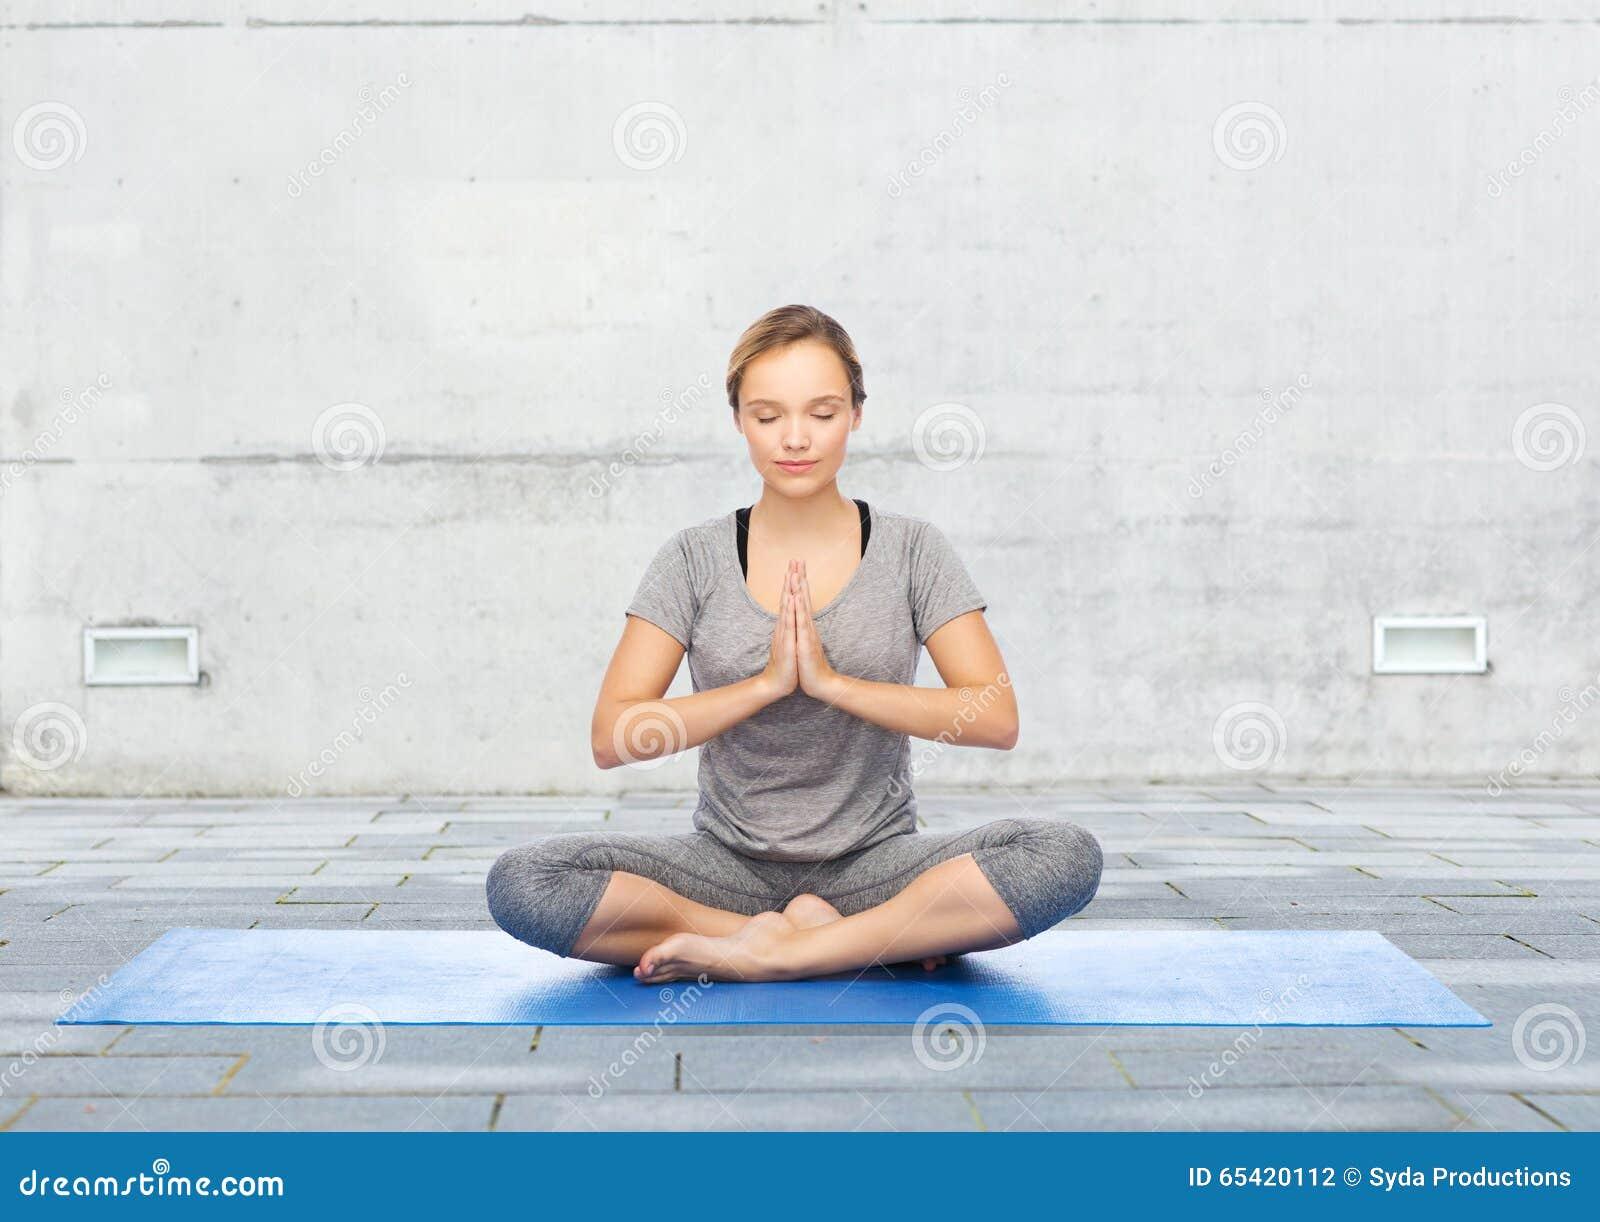 Yoga Meditating Lotus Position Exercising Woman